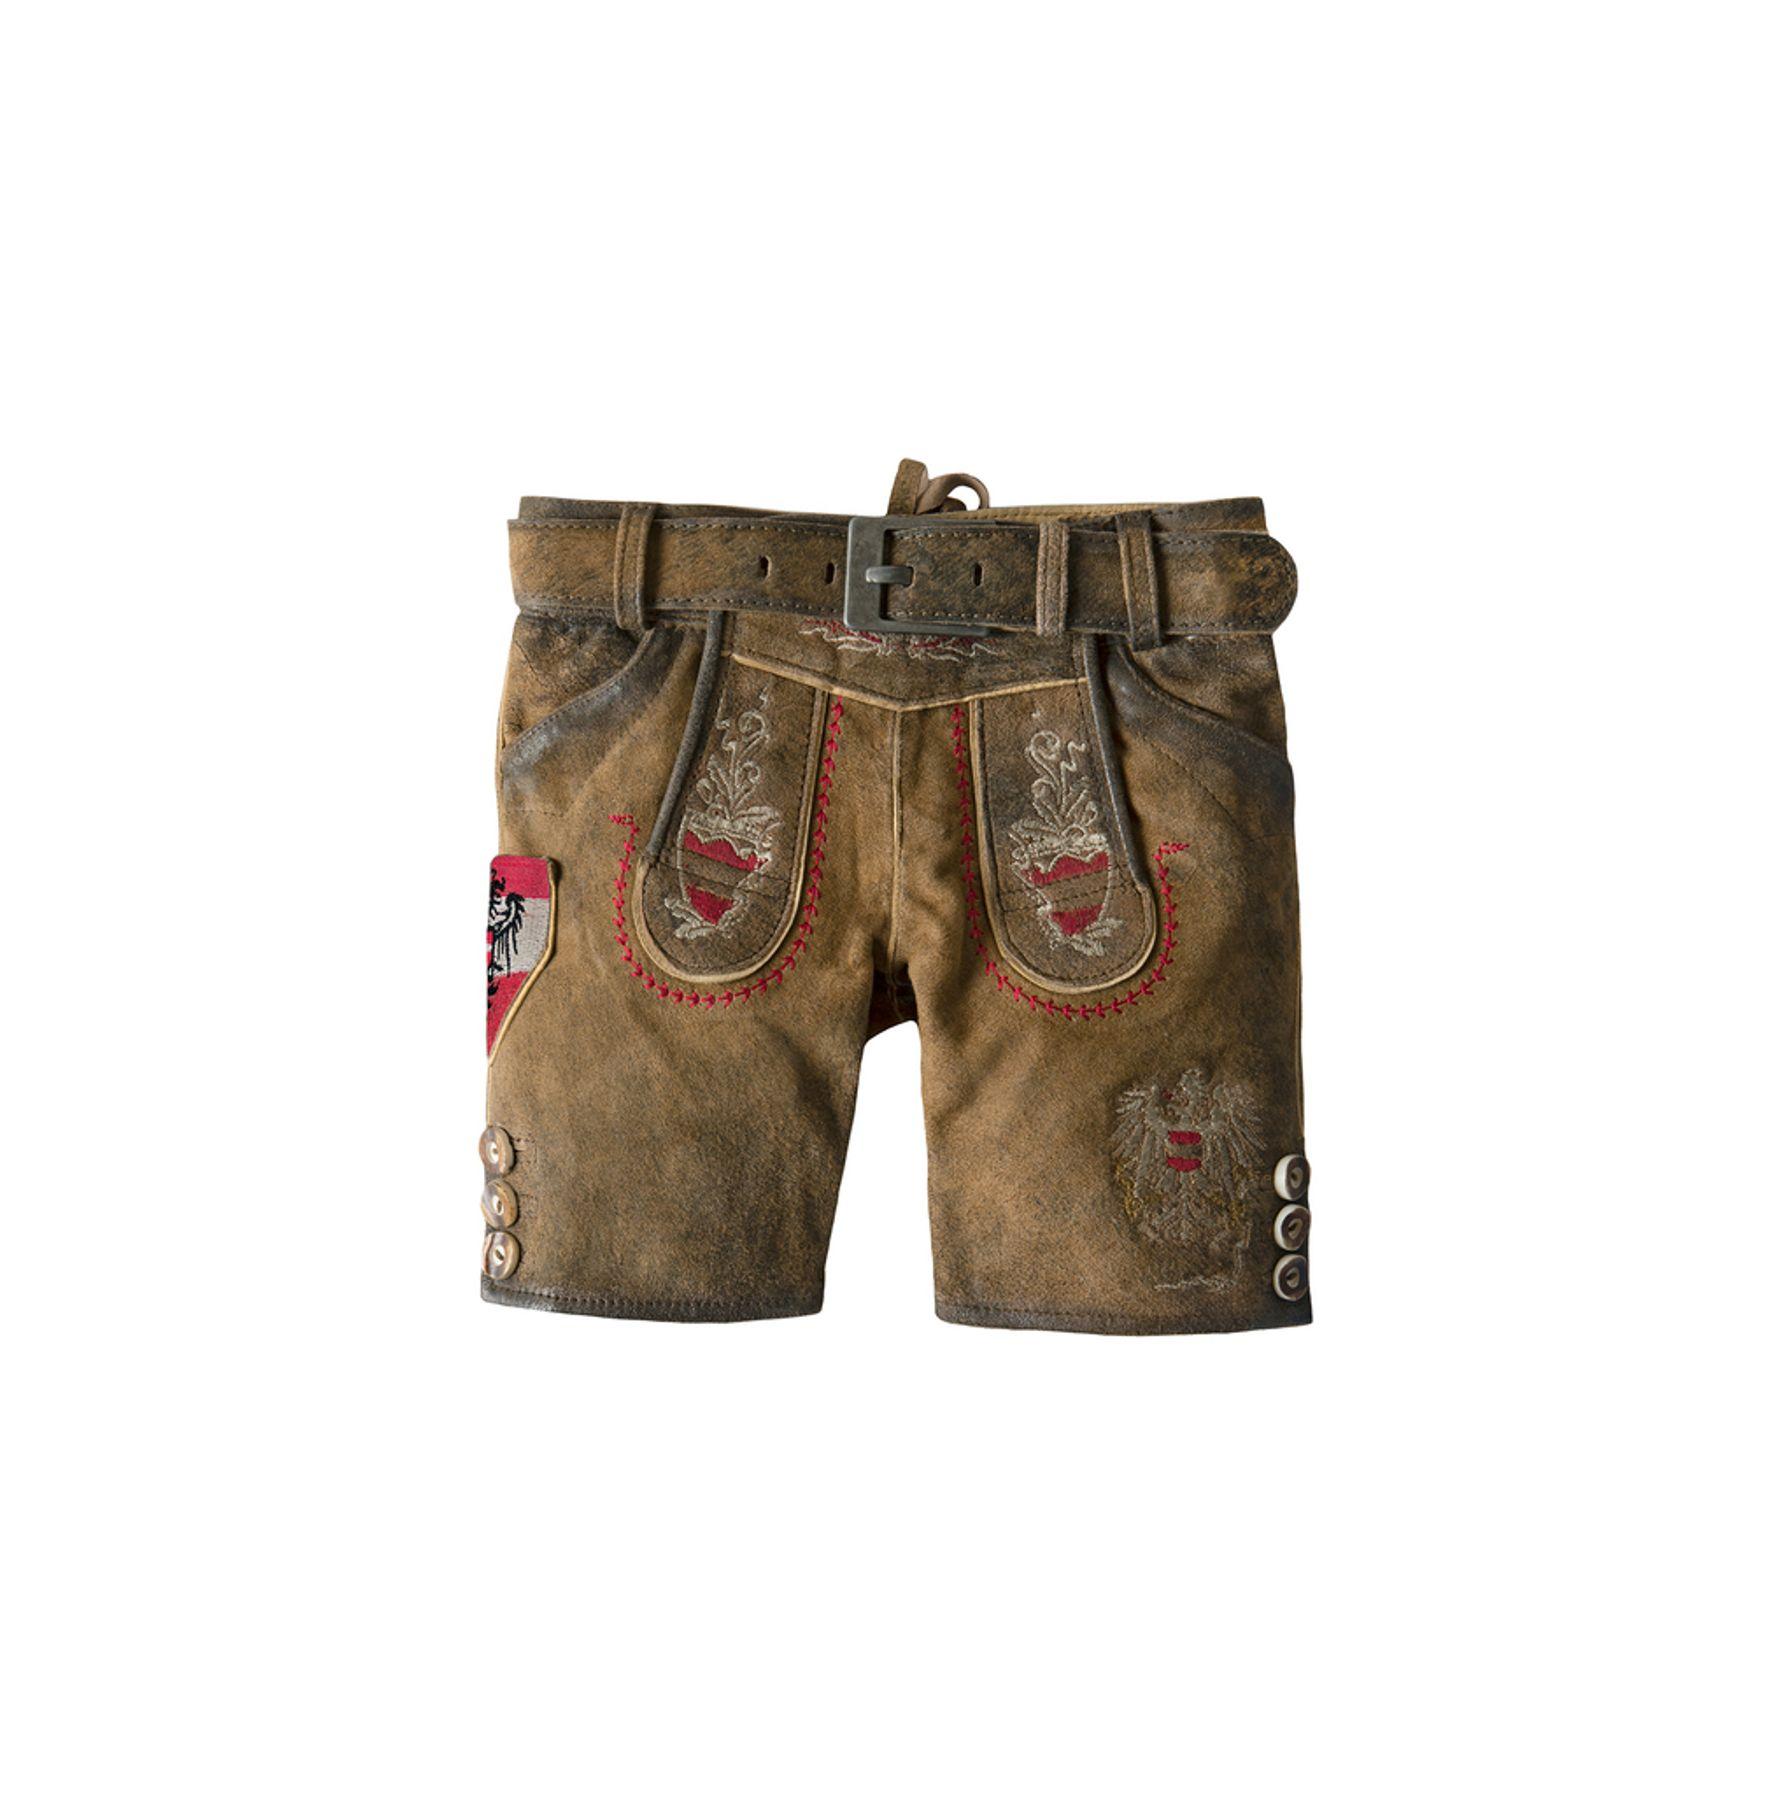 Stockerpoint - Kinder Trachten Lederhose mit Gürtel, Austria jr. Gr: 86-116 – Bild 1